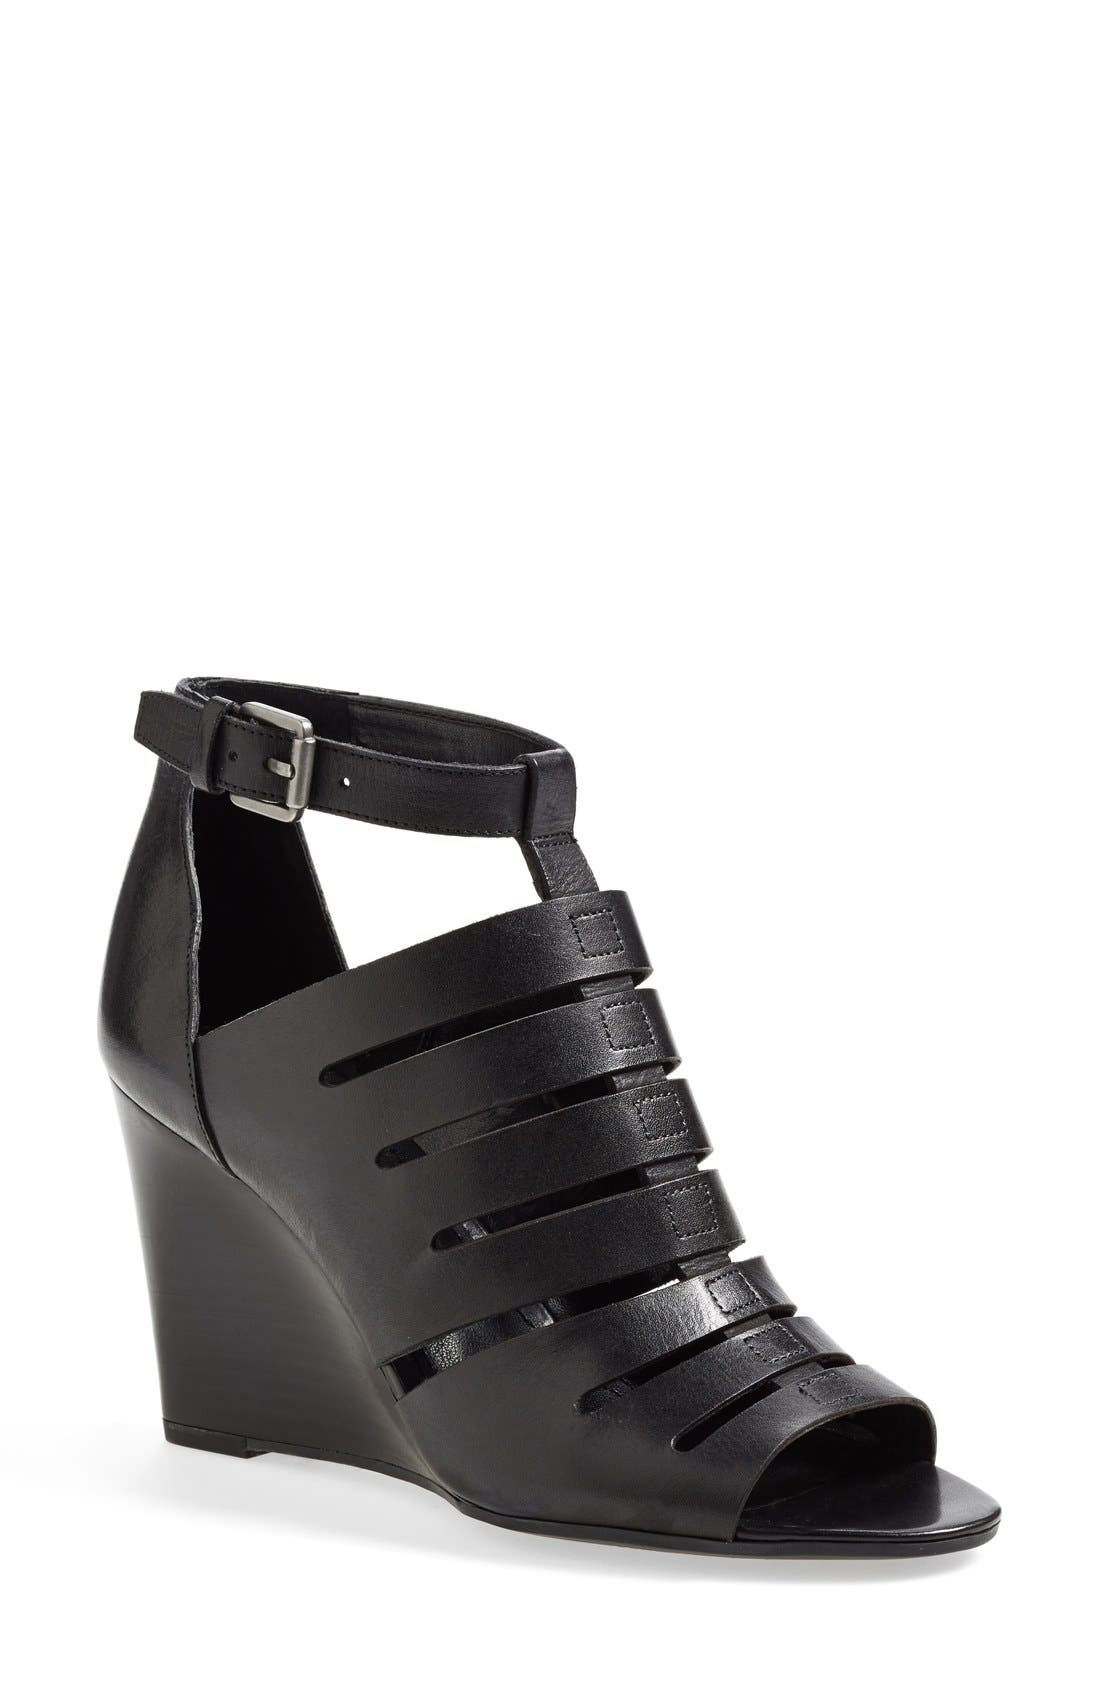 Alternate Image 1 Selected - Franco Sarto 'Faryn' Wedge Sandal (Online Only) (Women)